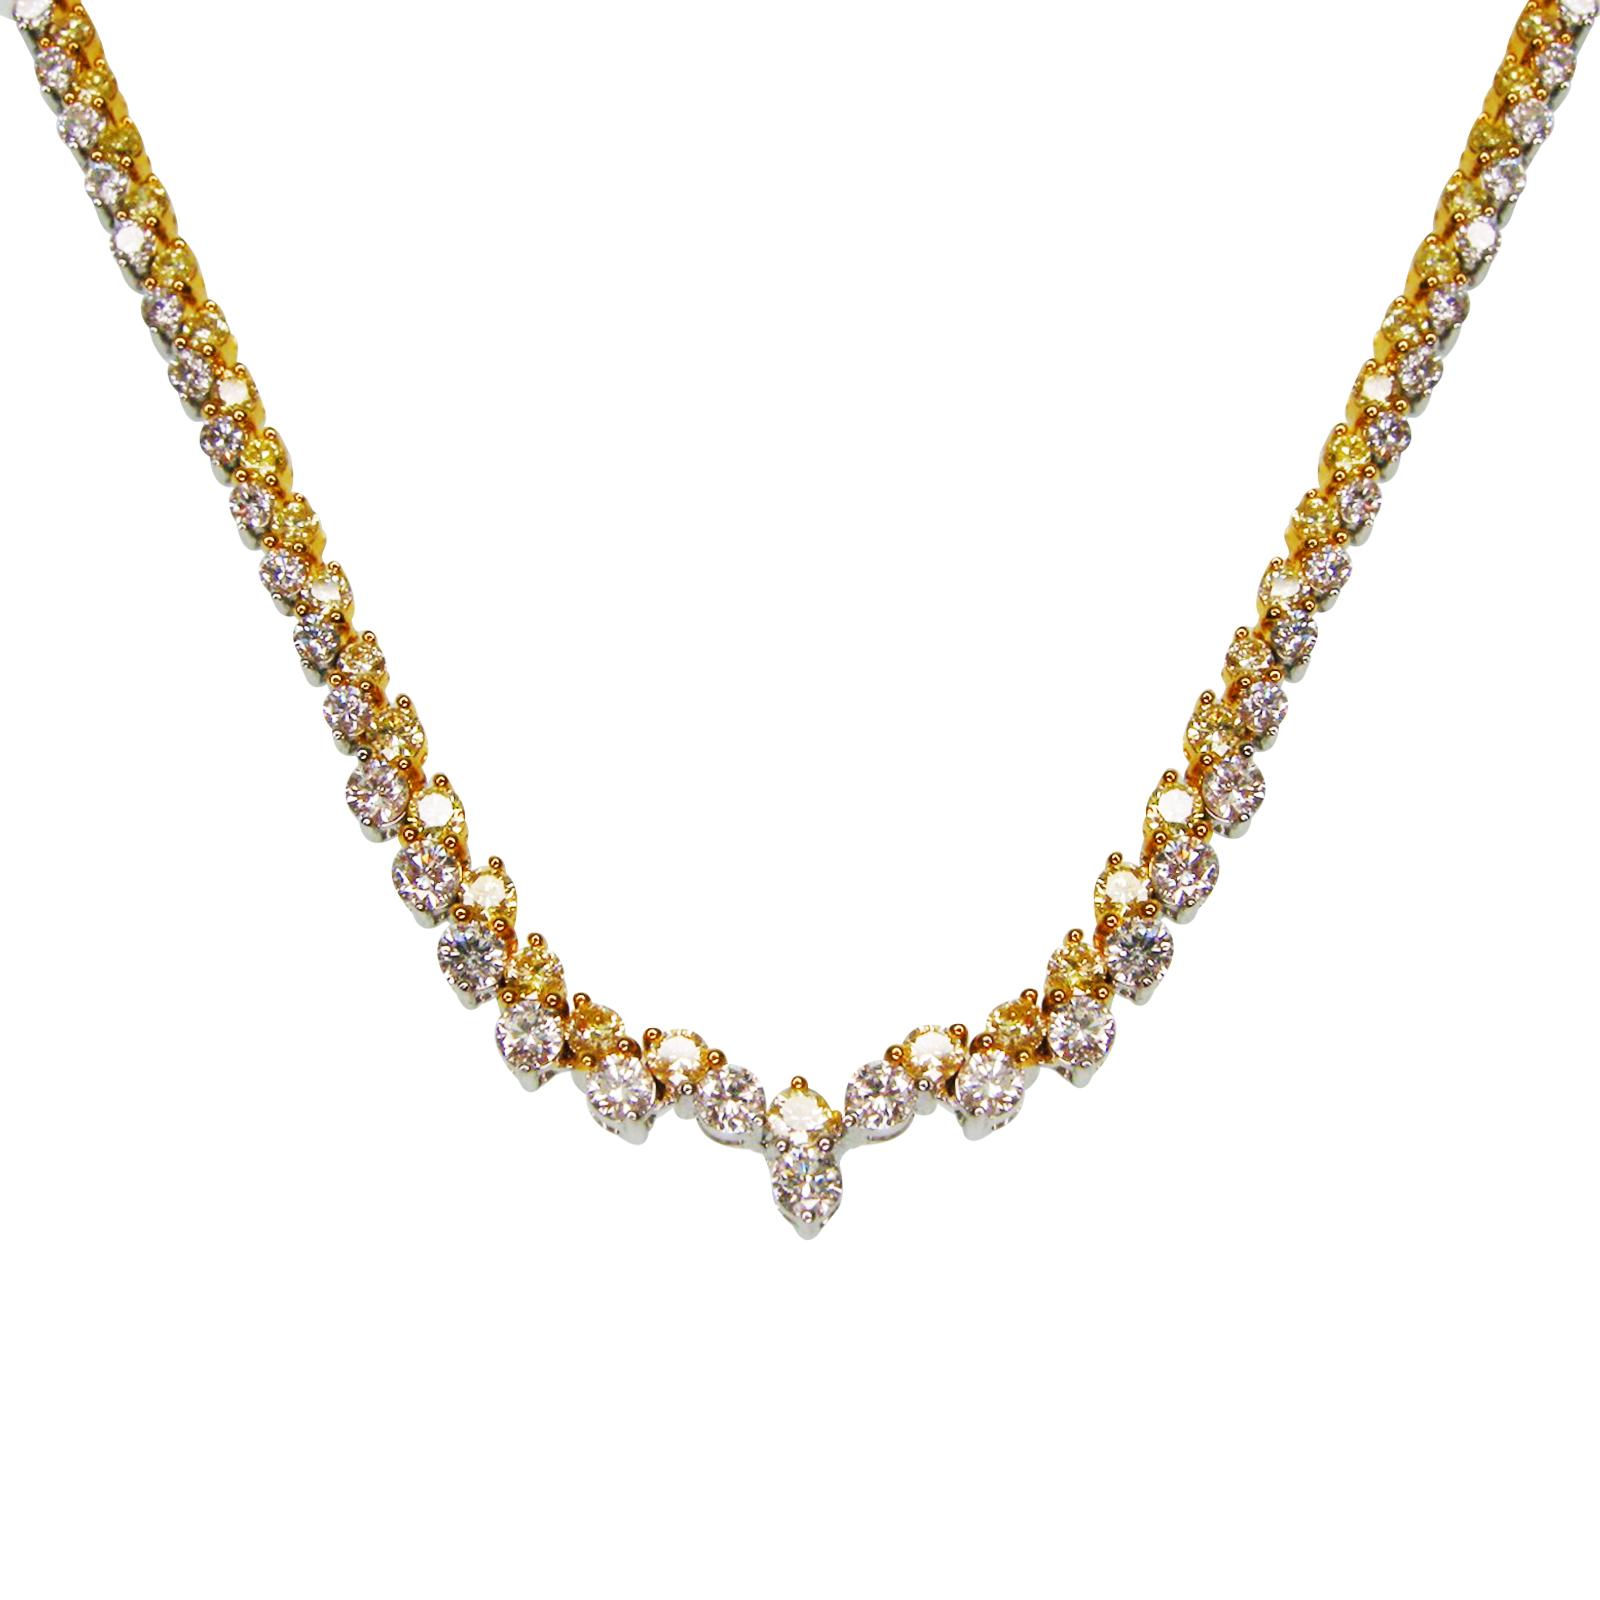 FANCY YELLOW DIAMOND AND DIAMOND TENNIS NECKLACE